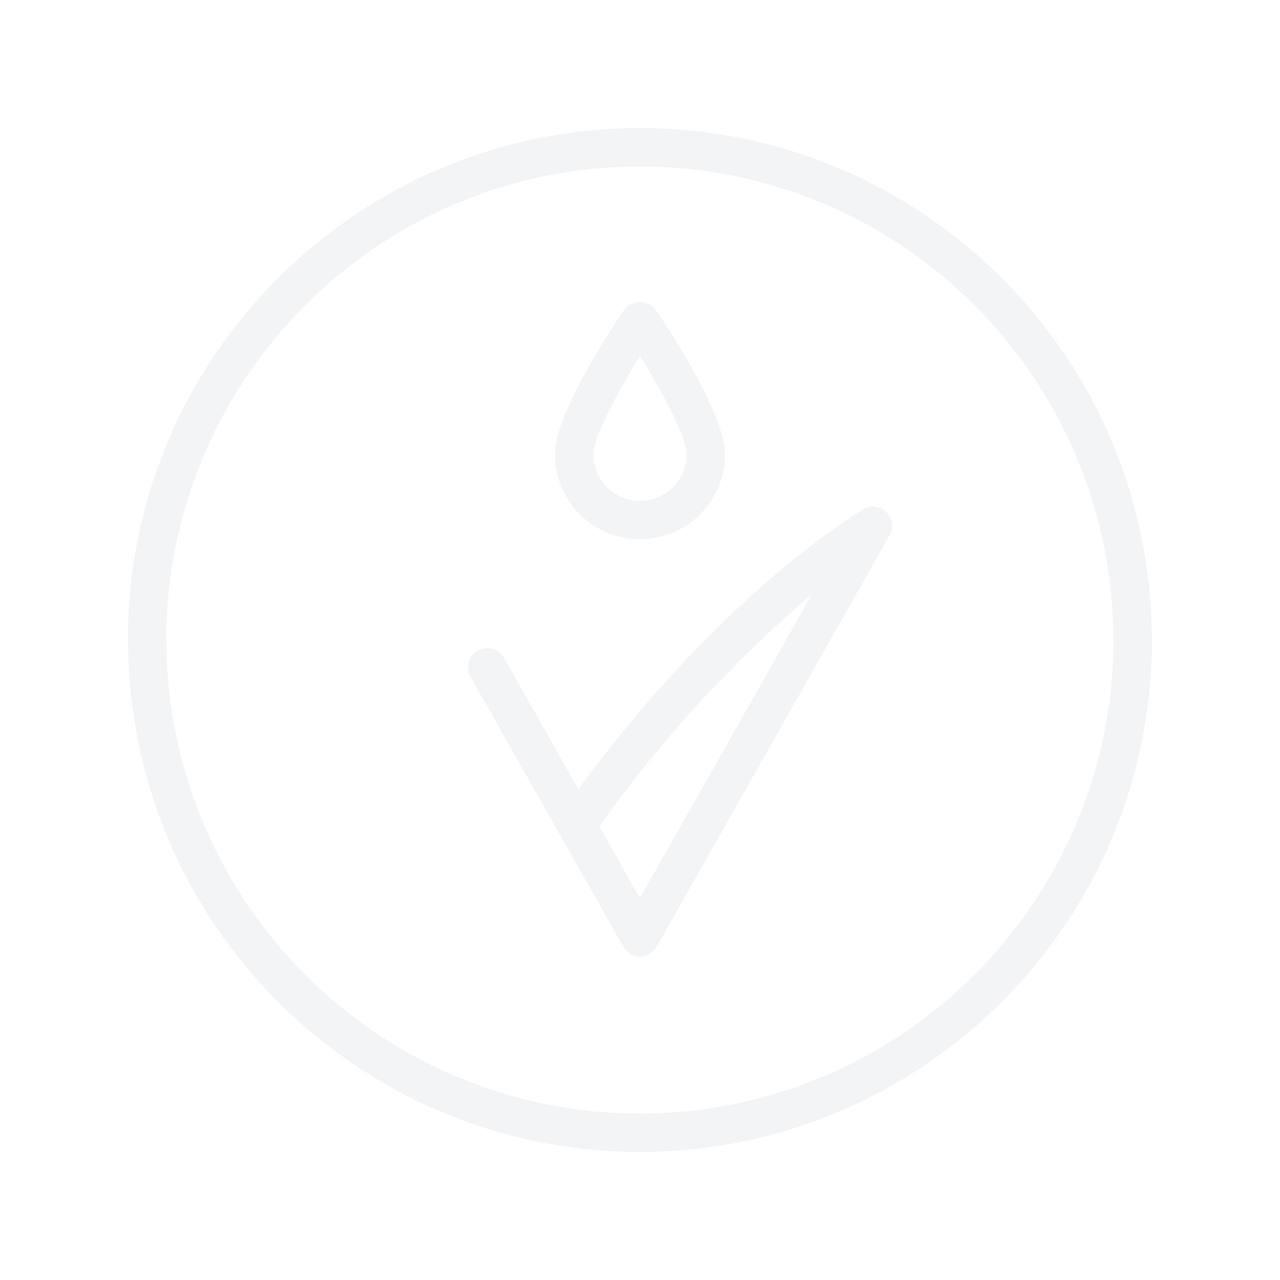 MAYBELLINE Lash Sensational Mascara Brown 9.4ml